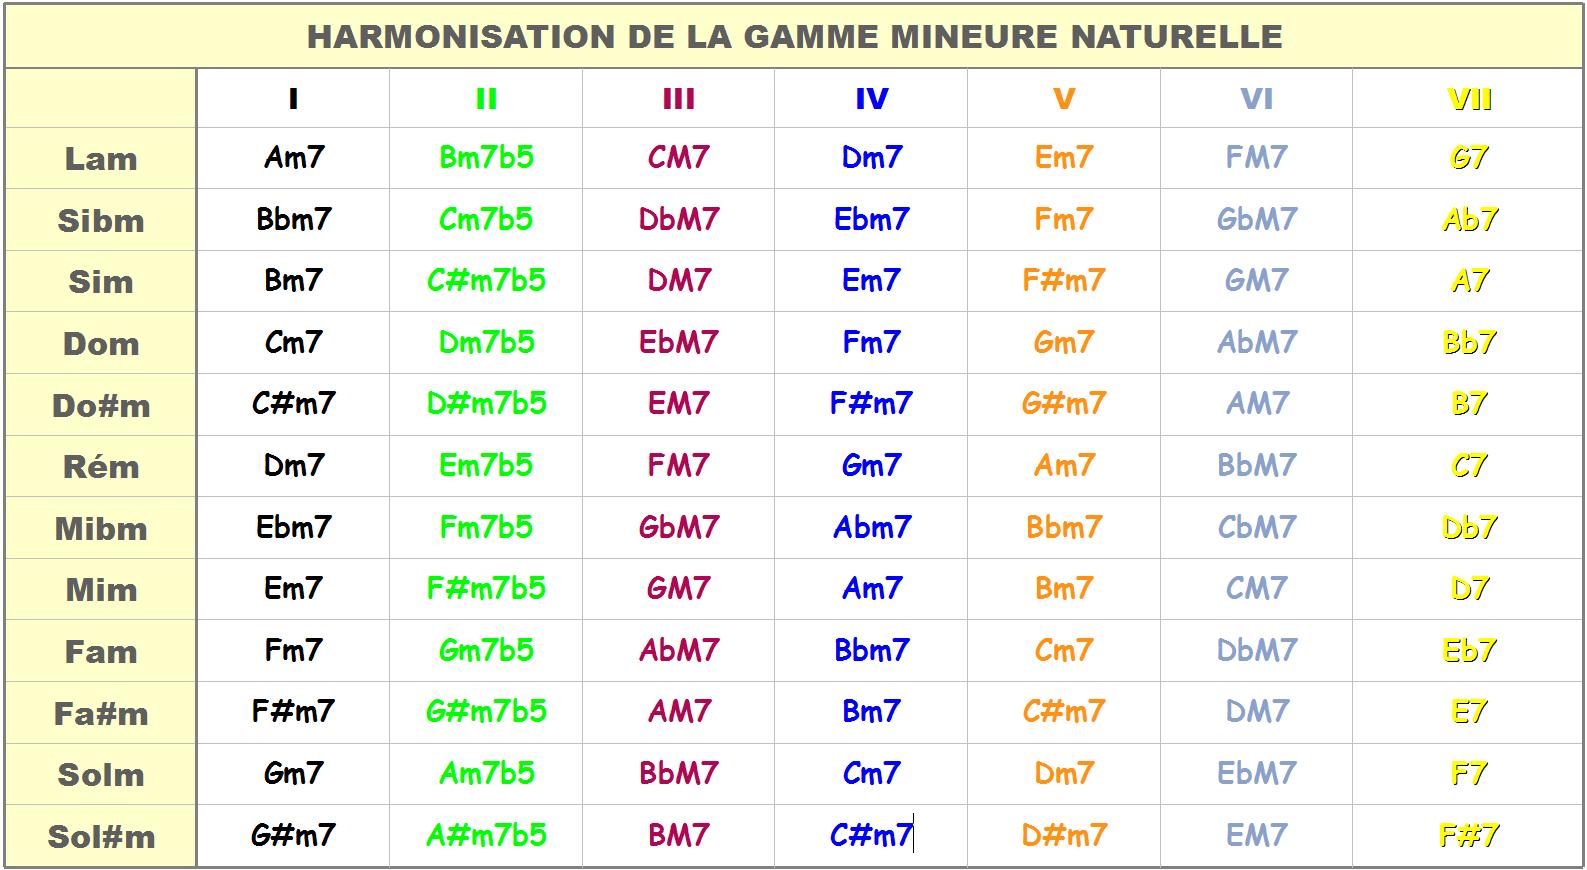 Tableau harmonisation gamme mineure naturelle